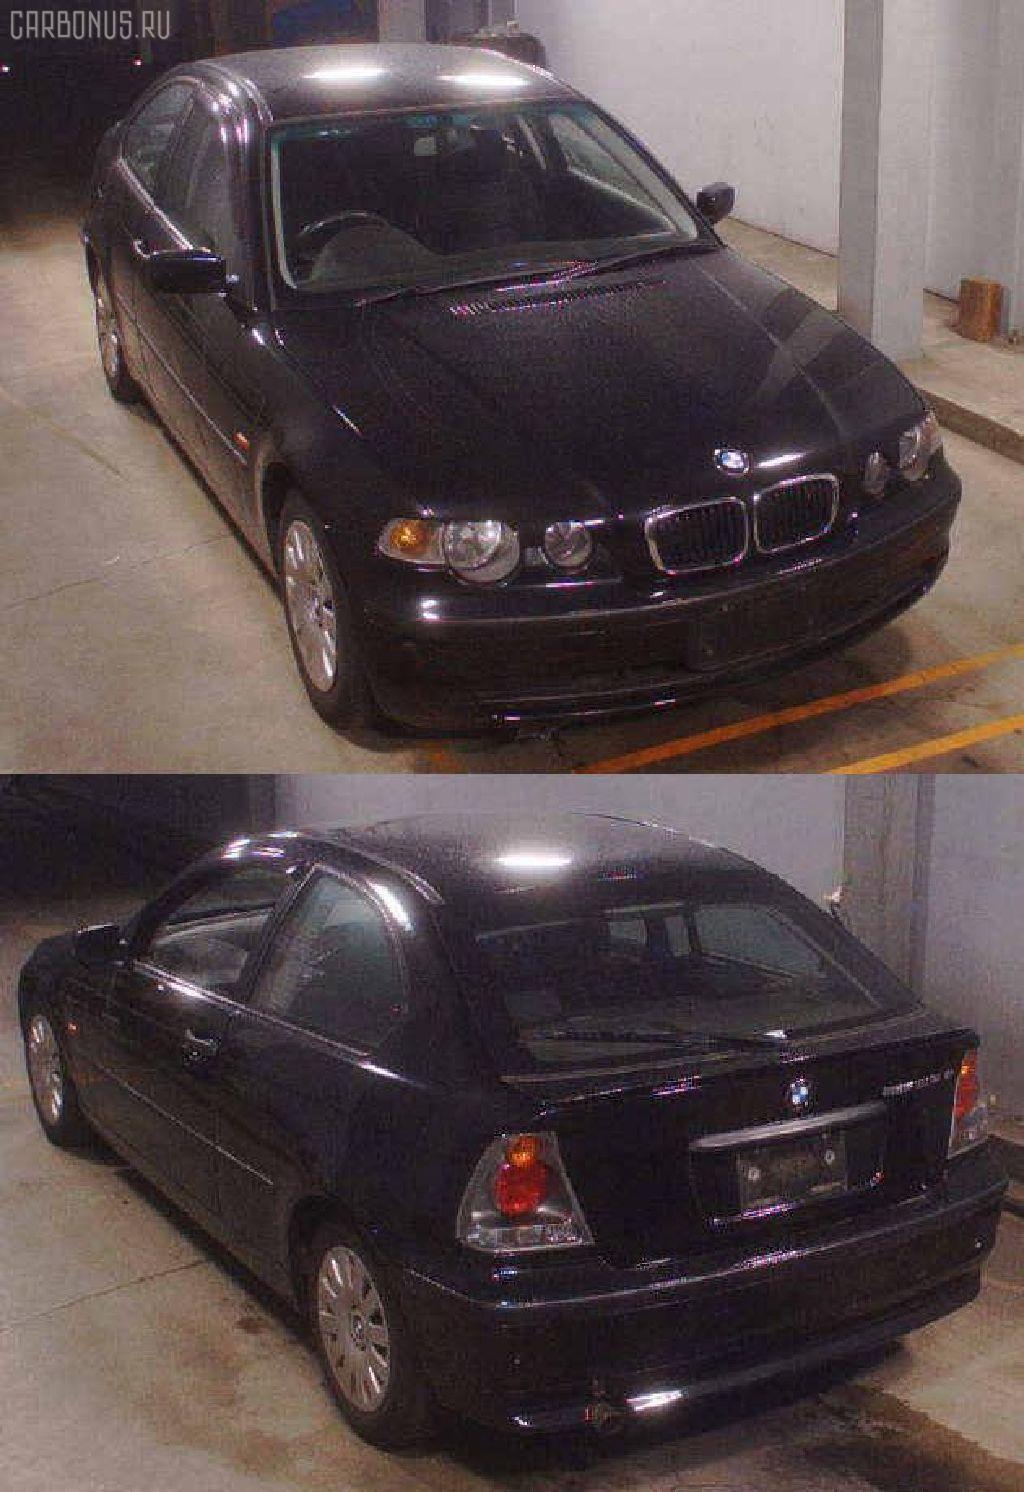 Порог кузова пластиковый ( обвес ) BMW 3-SERIES E46-AT52 Фото 4